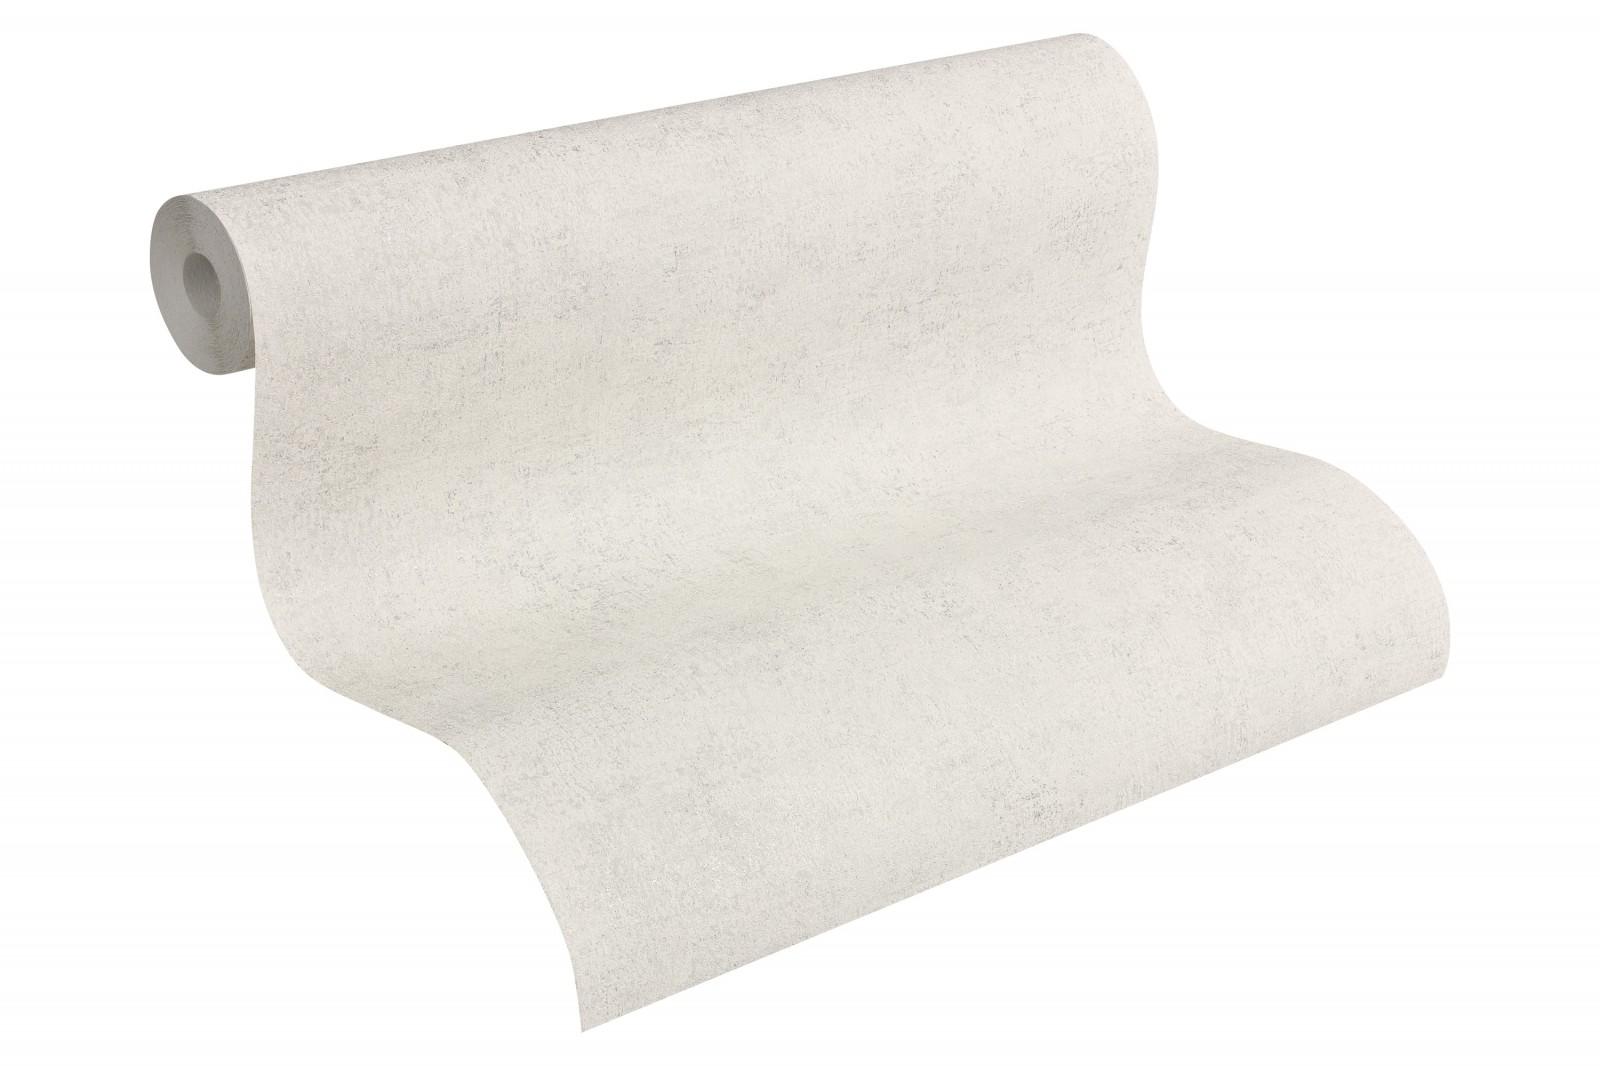 vliestapete wei grau uni livingwalls 96079 6. Black Bedroom Furniture Sets. Home Design Ideas